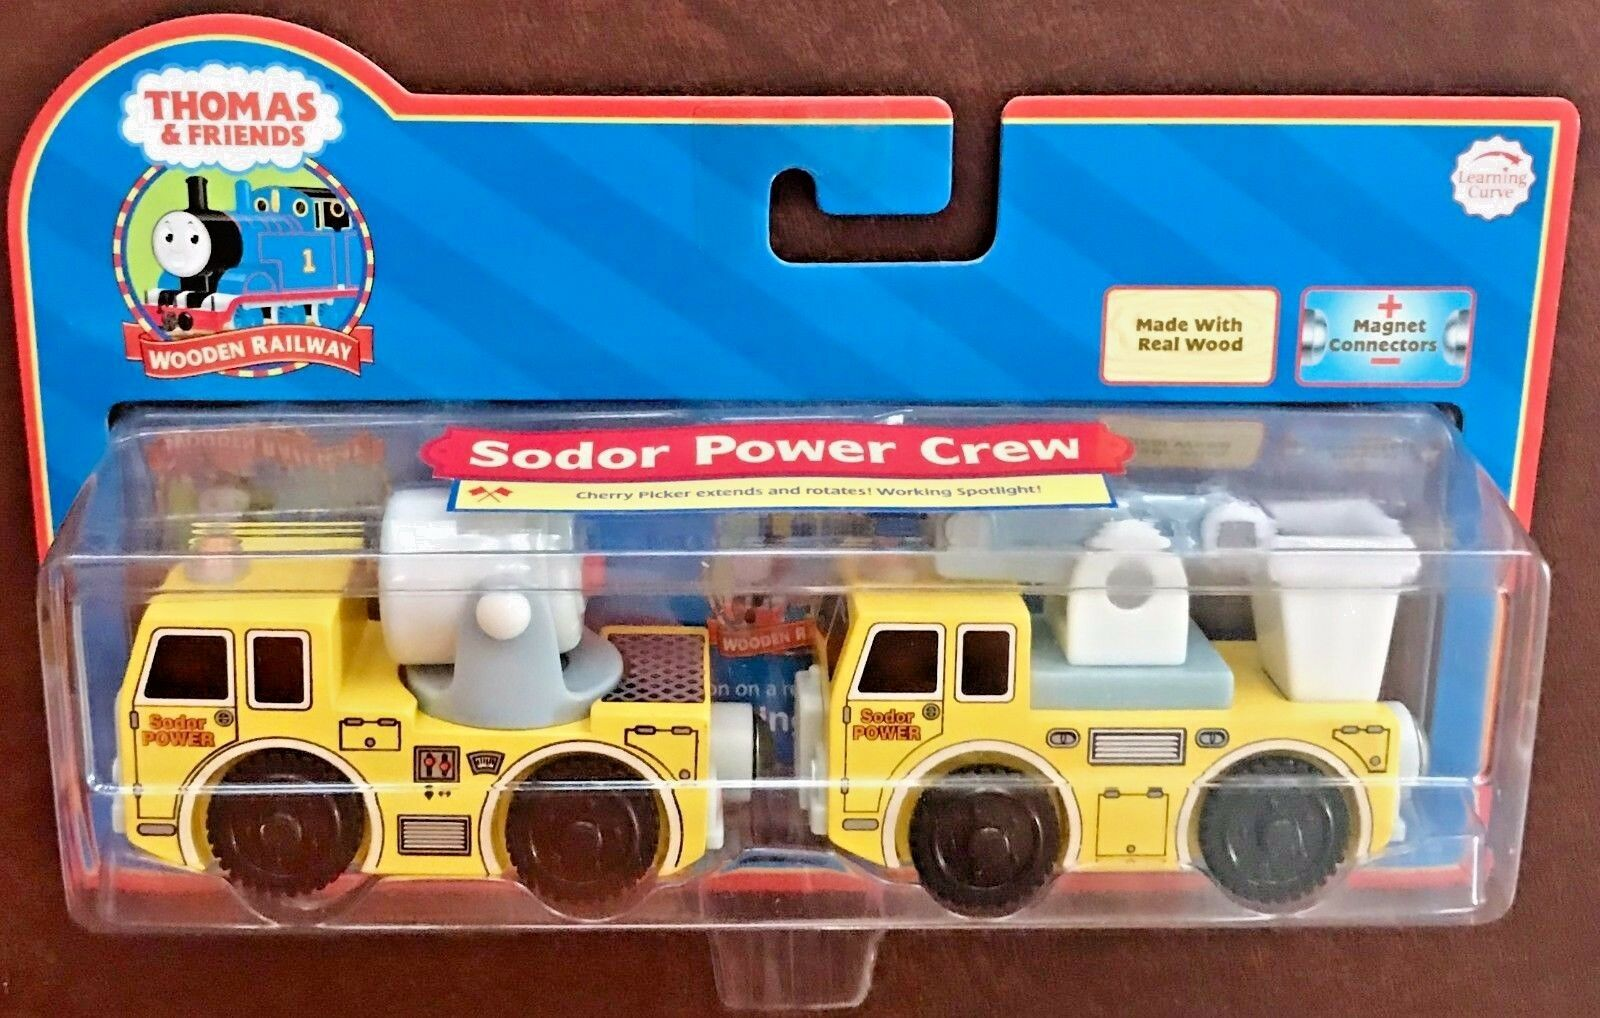 Thomas & Friends Wooden Railway Sodor Power Crew  LC99128